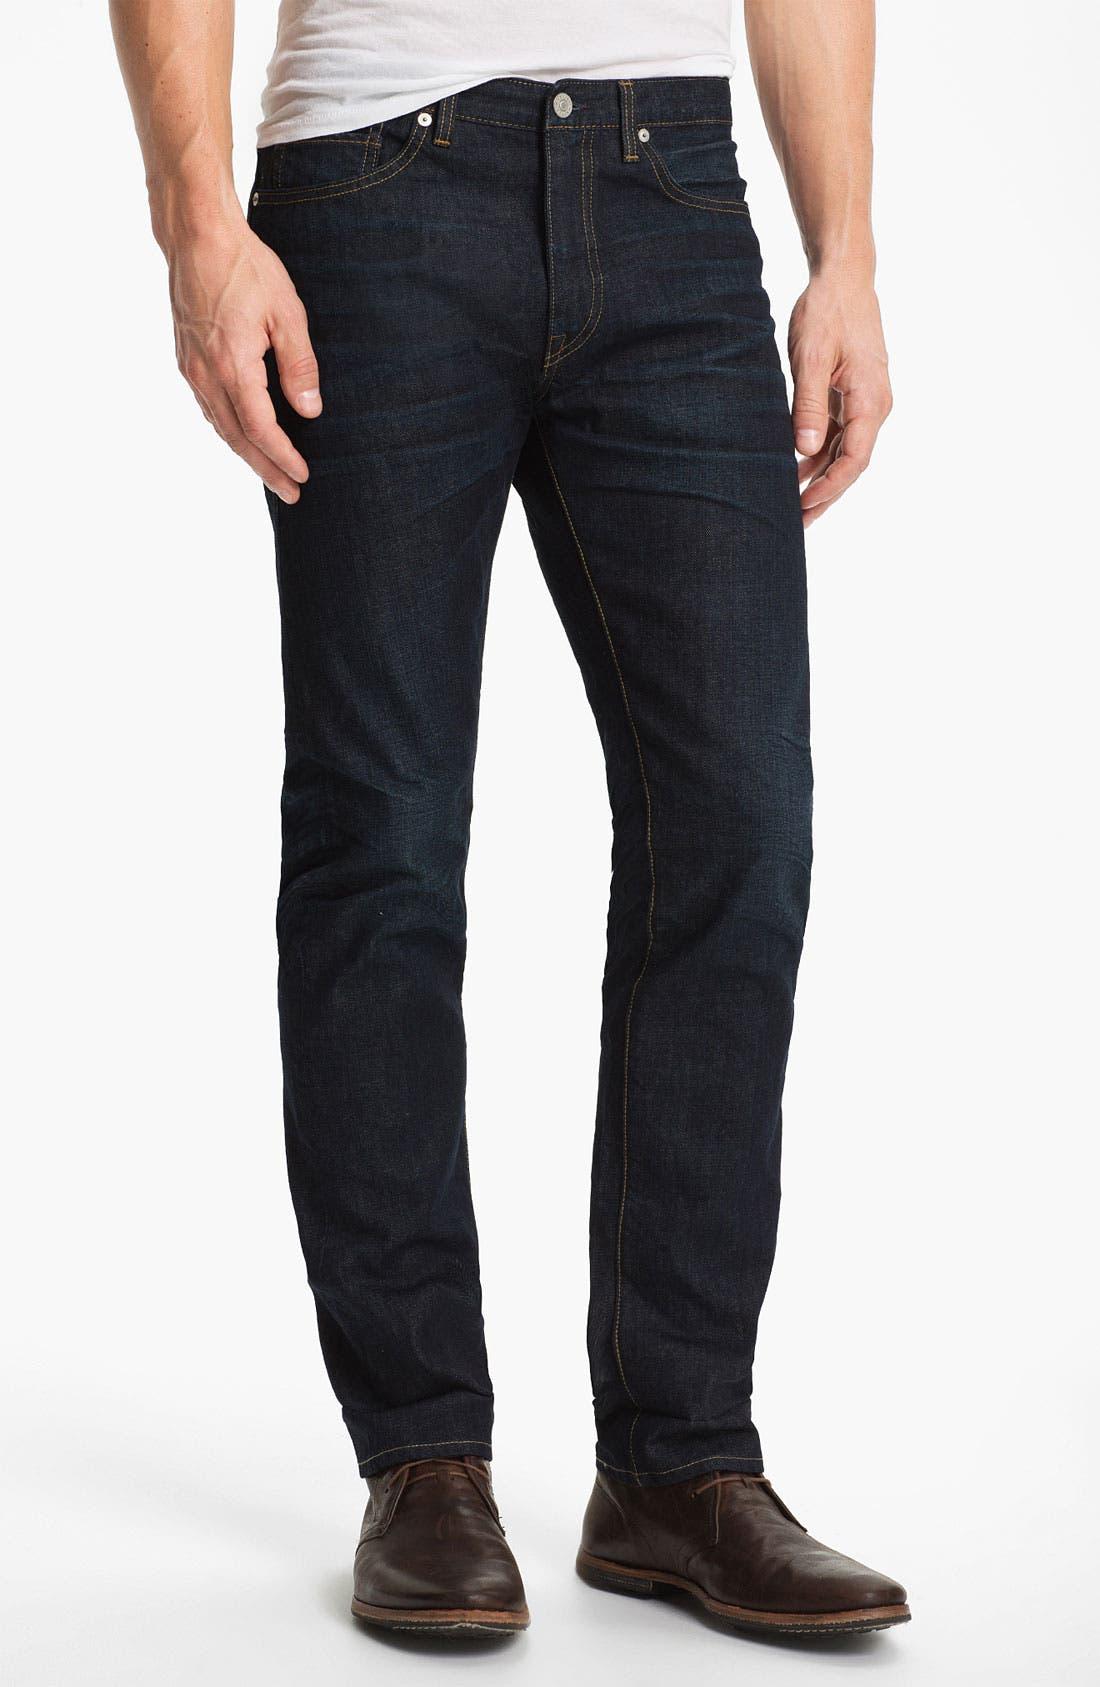 Main Image - Levi's® Made & Crafted™ Slim Leg Jeans (Nova)